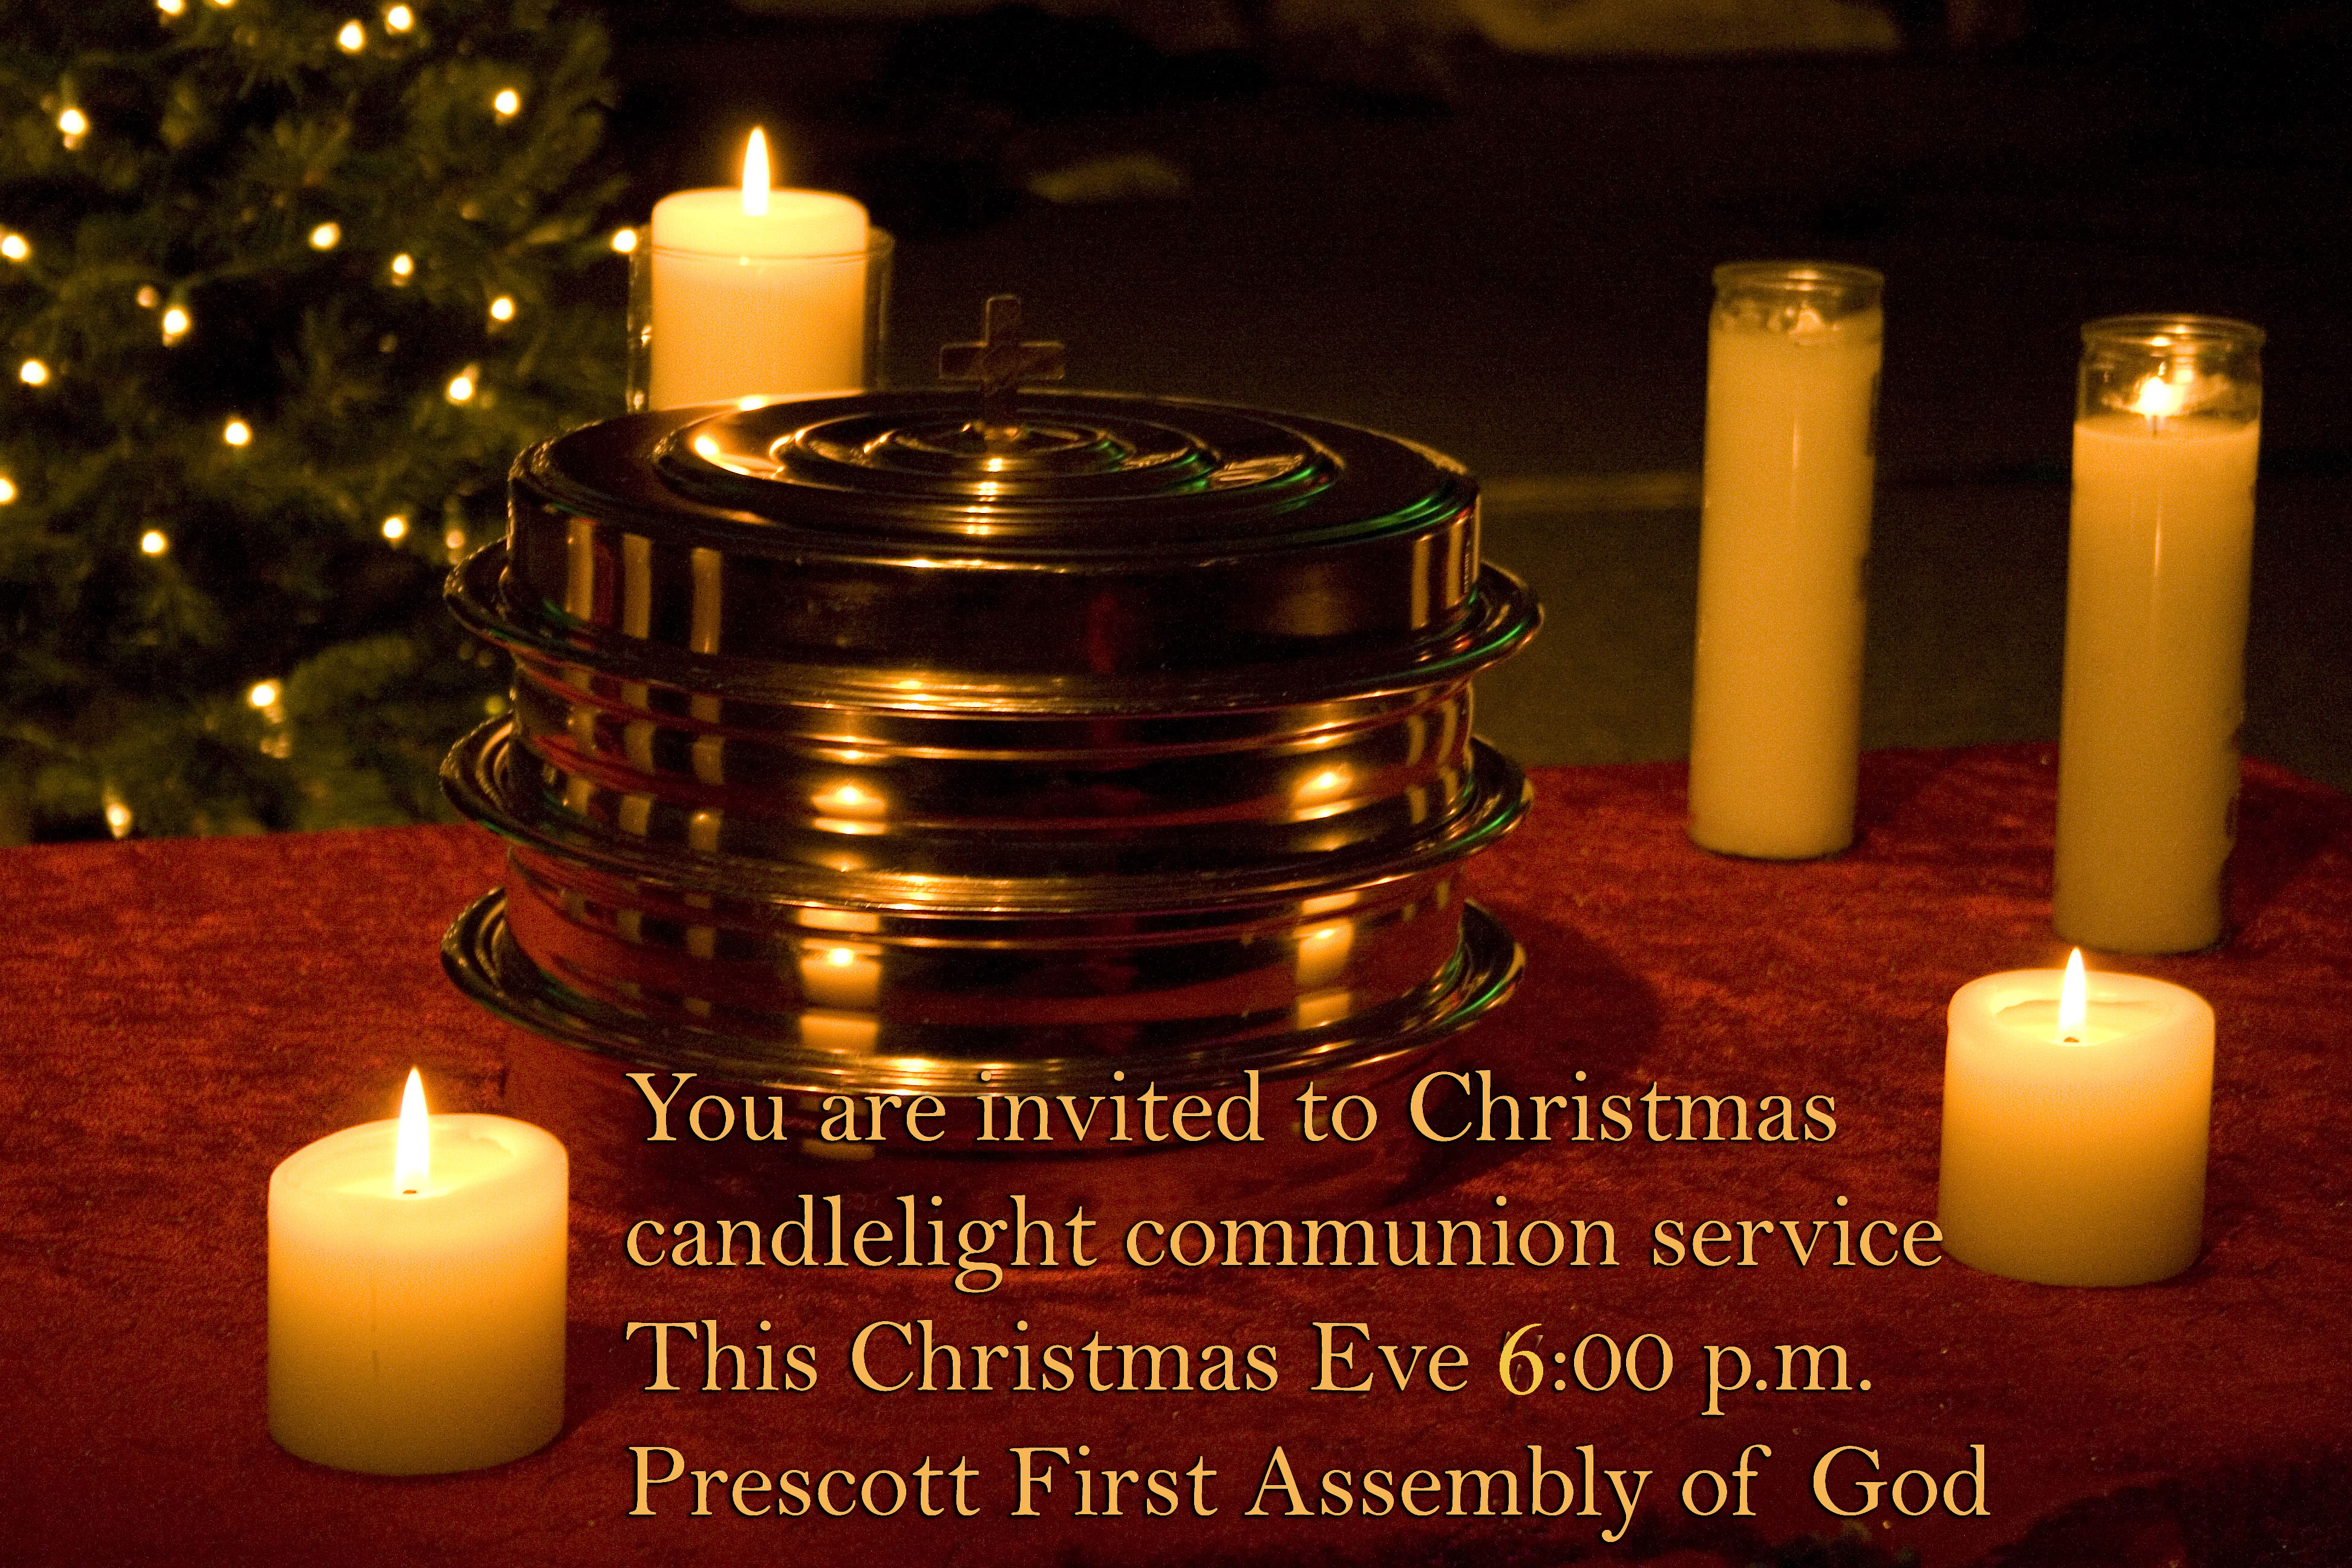 Celebration of christmas eve communion friday night december 24th